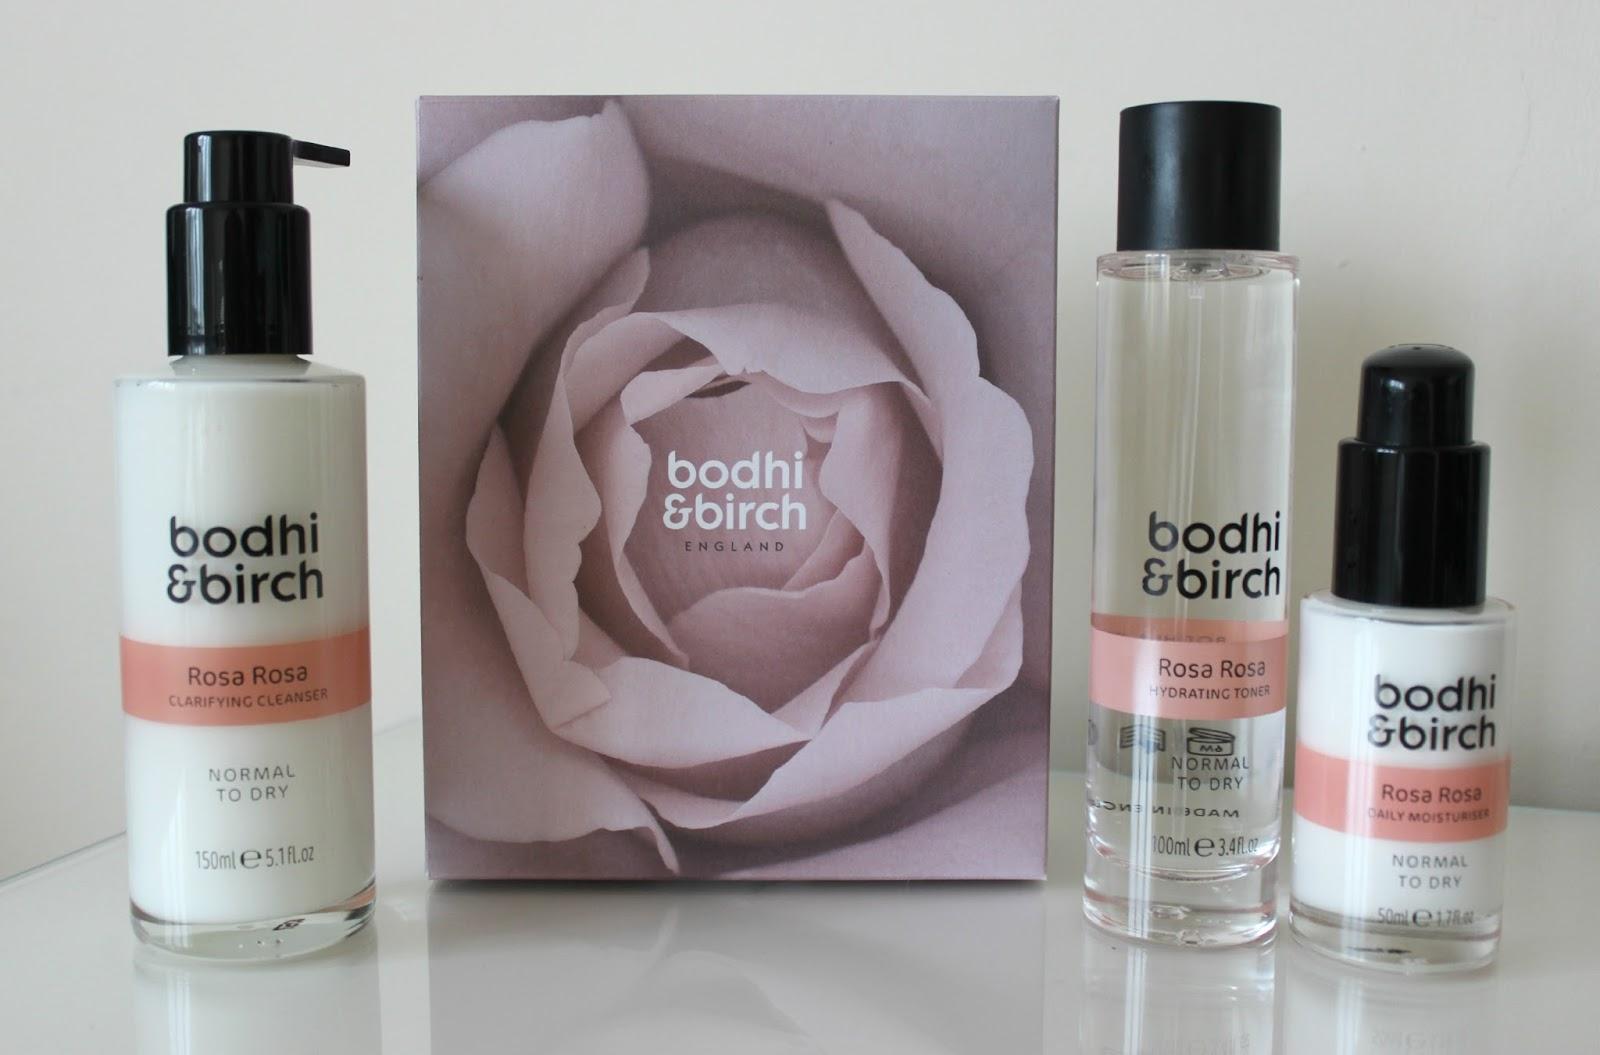 A picture of Bodhi & Birch Rosa Rosa Skincare Set